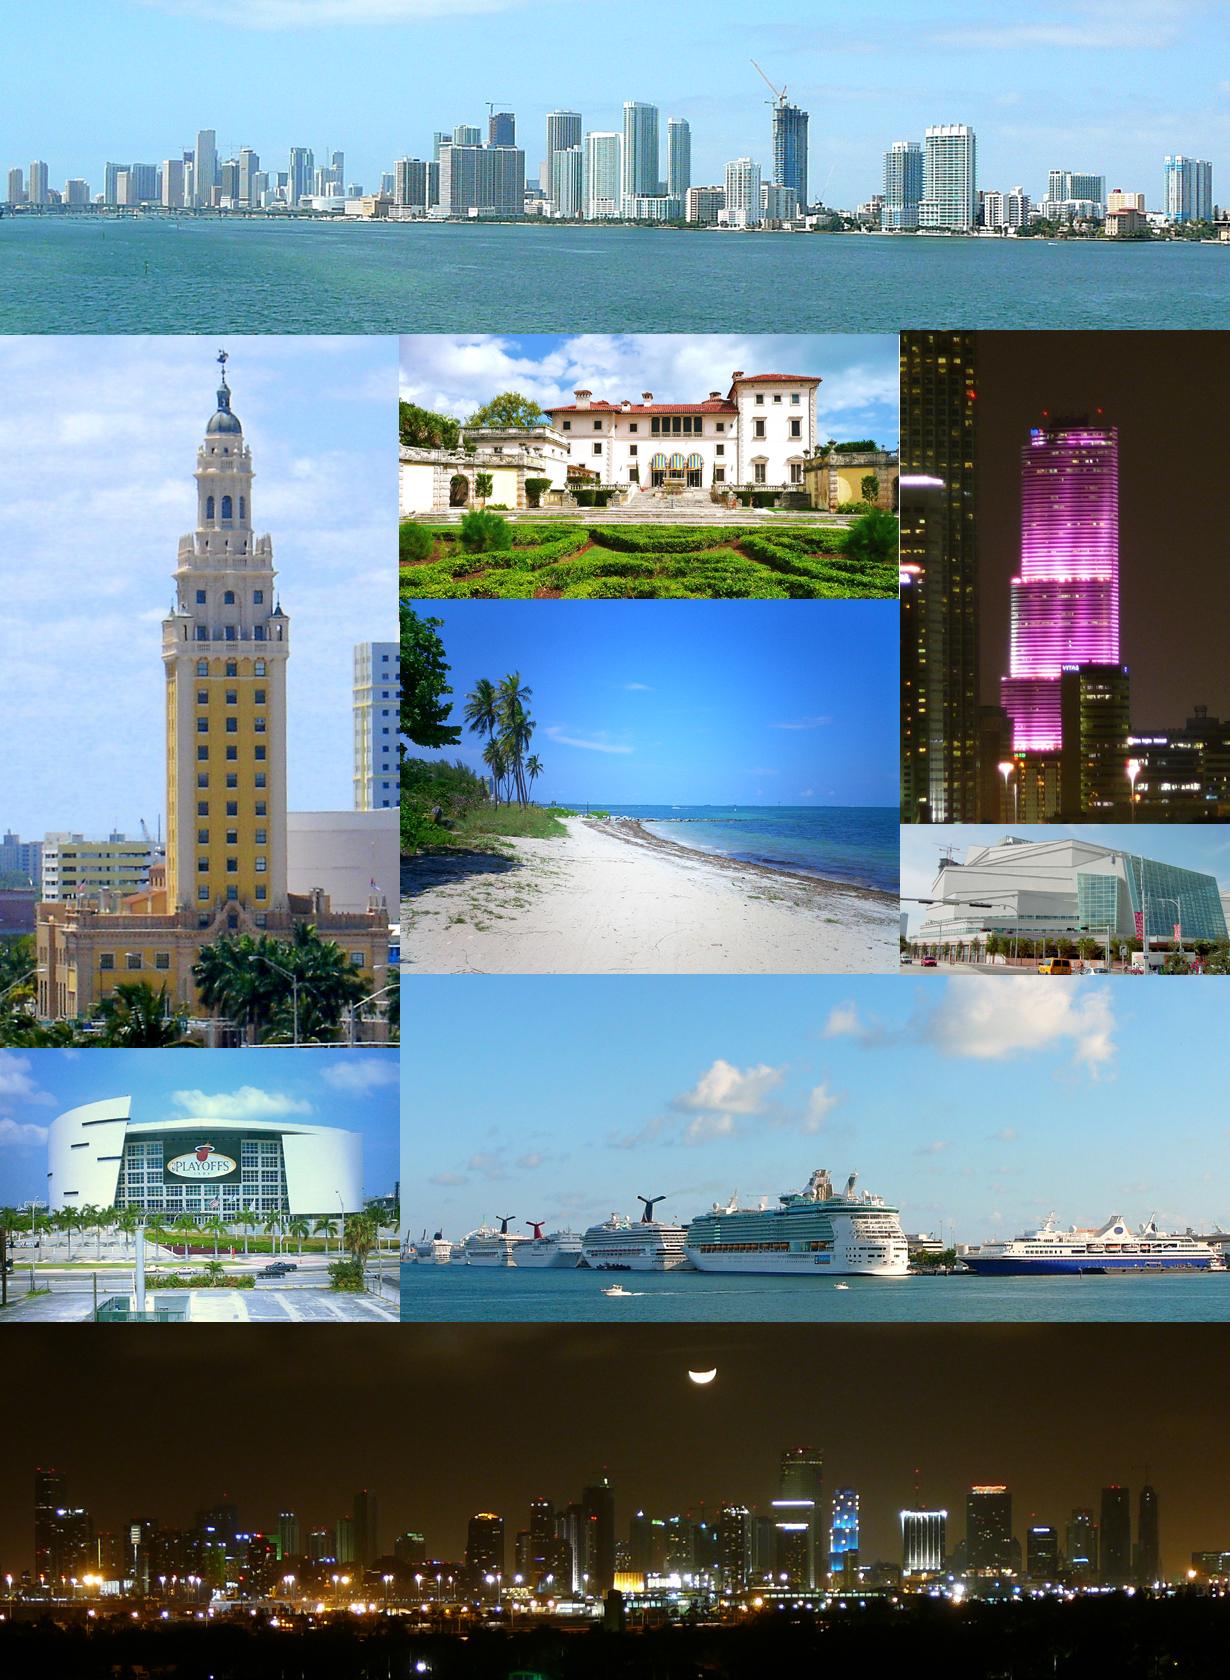 Photos from Miami